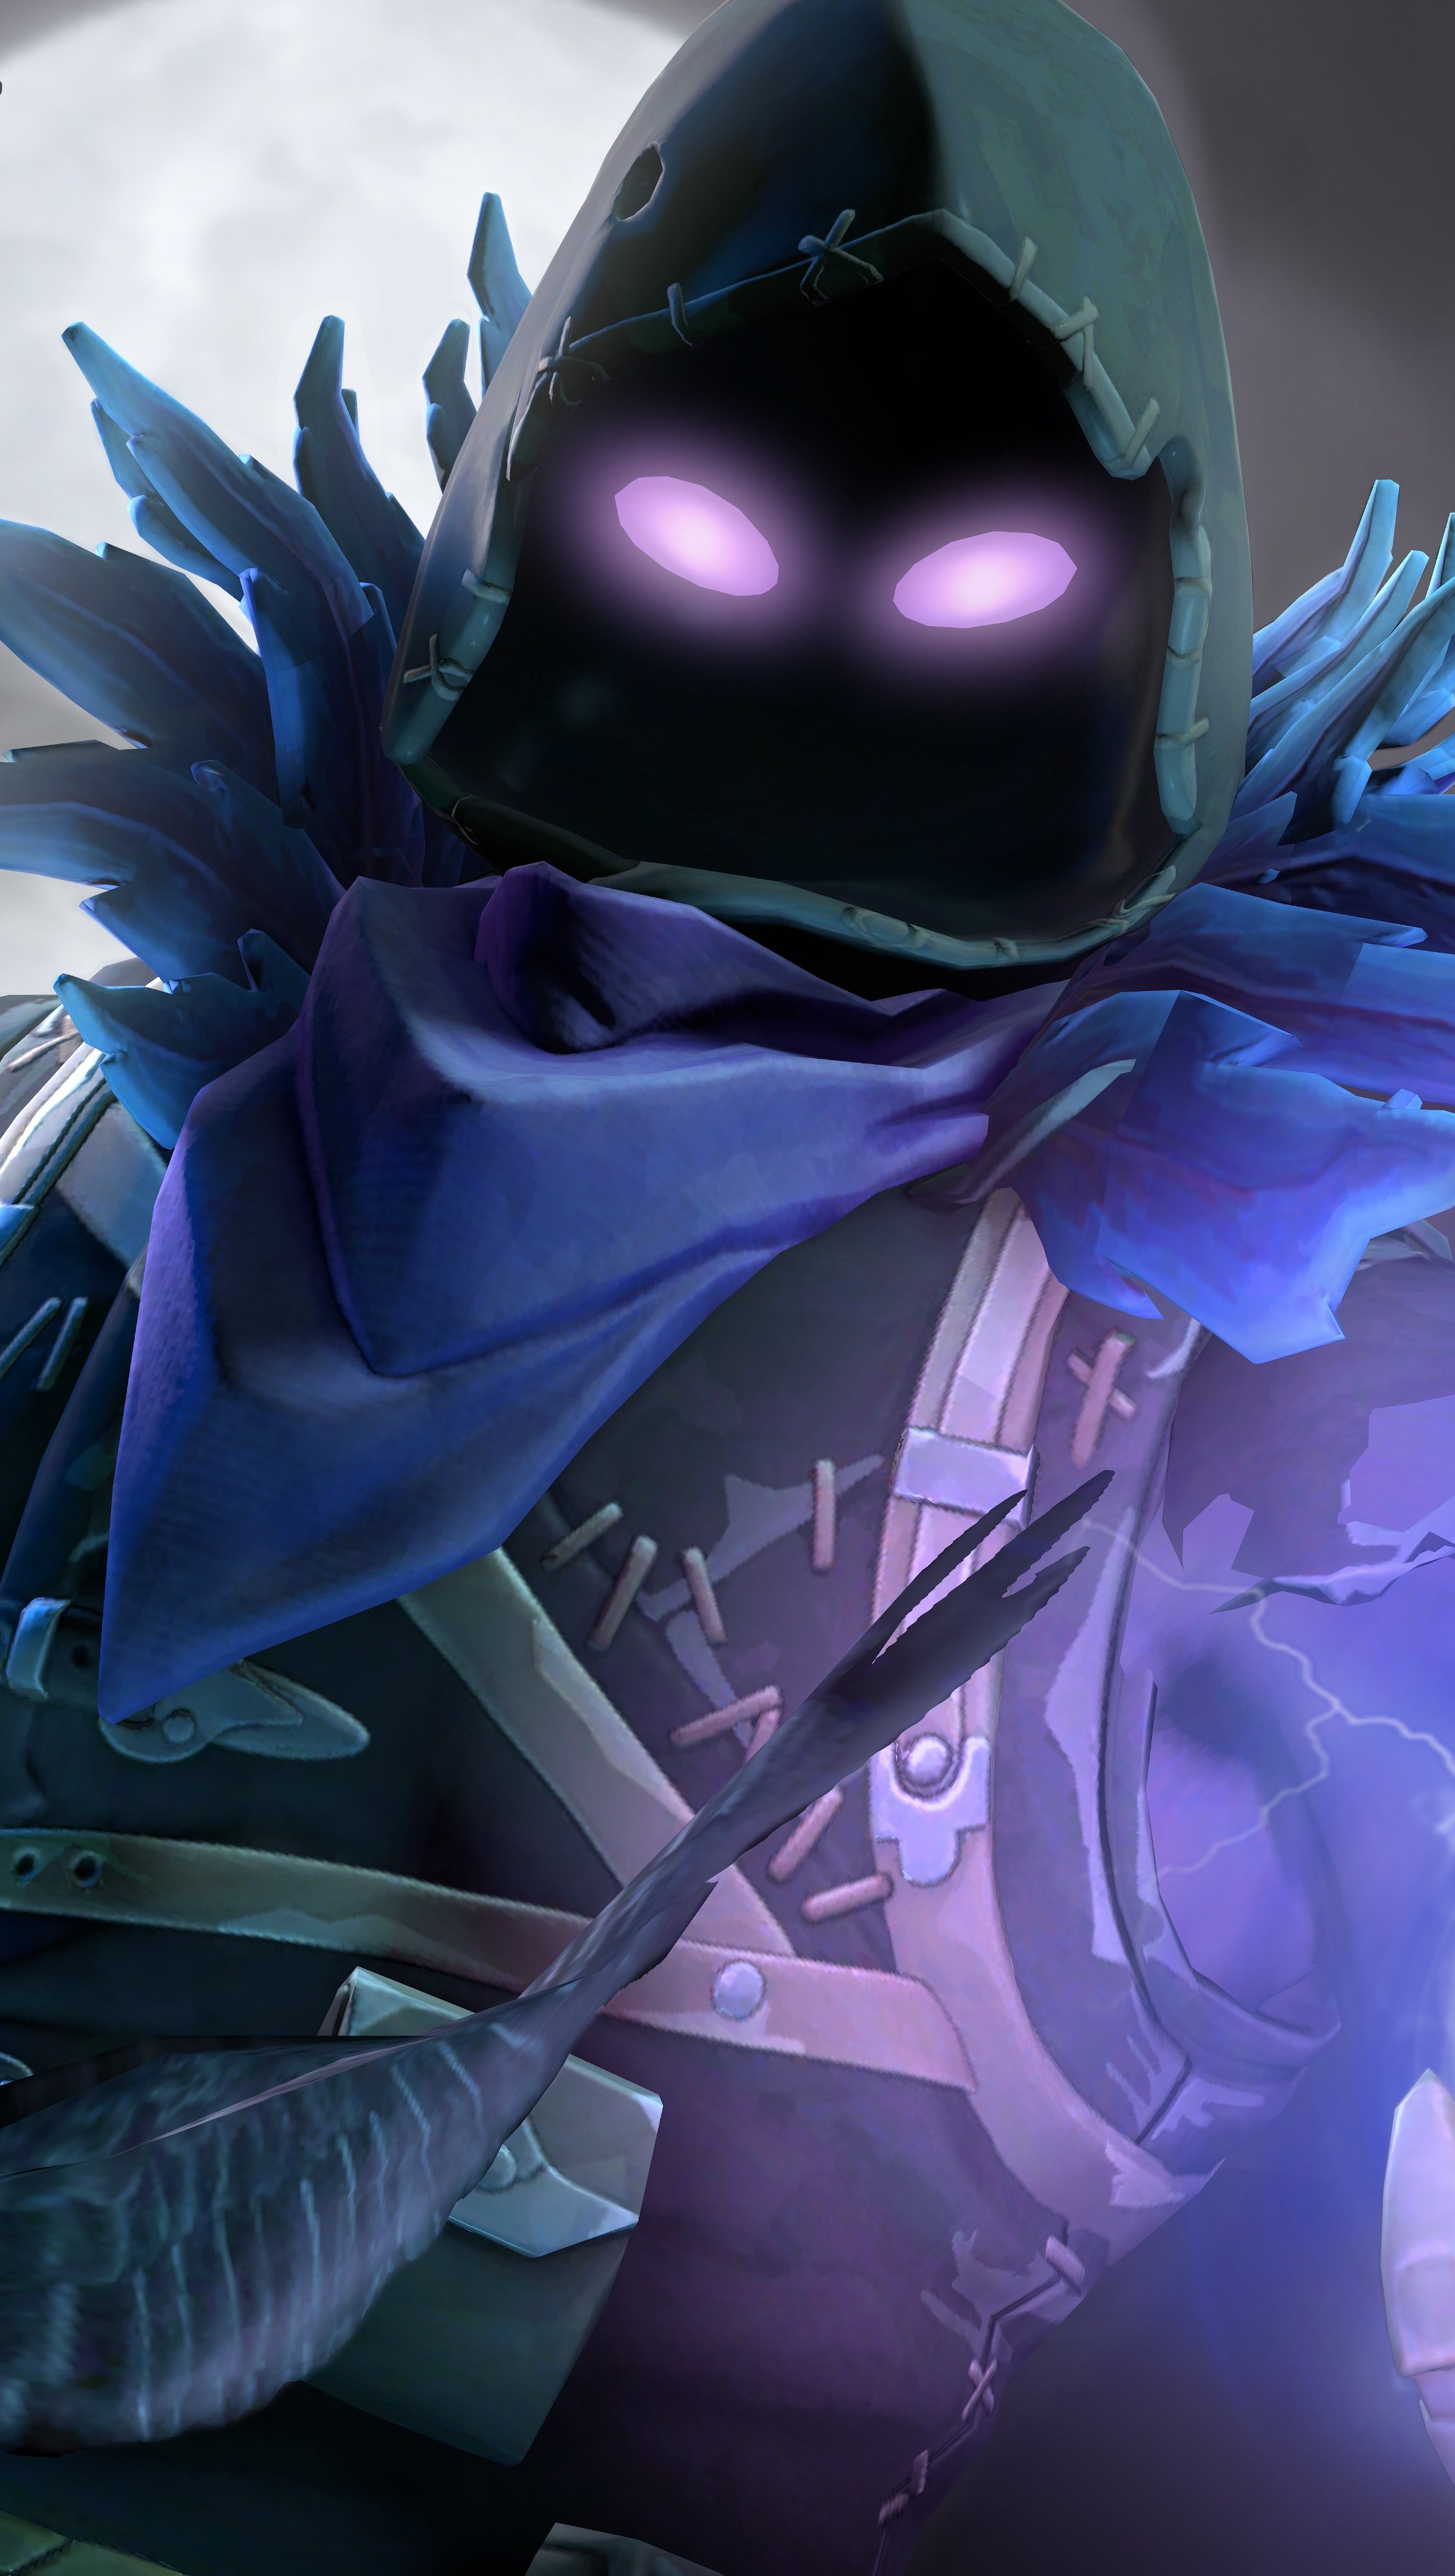 Fondos de pantalla Raven Fortnite Battle Royale Vertical